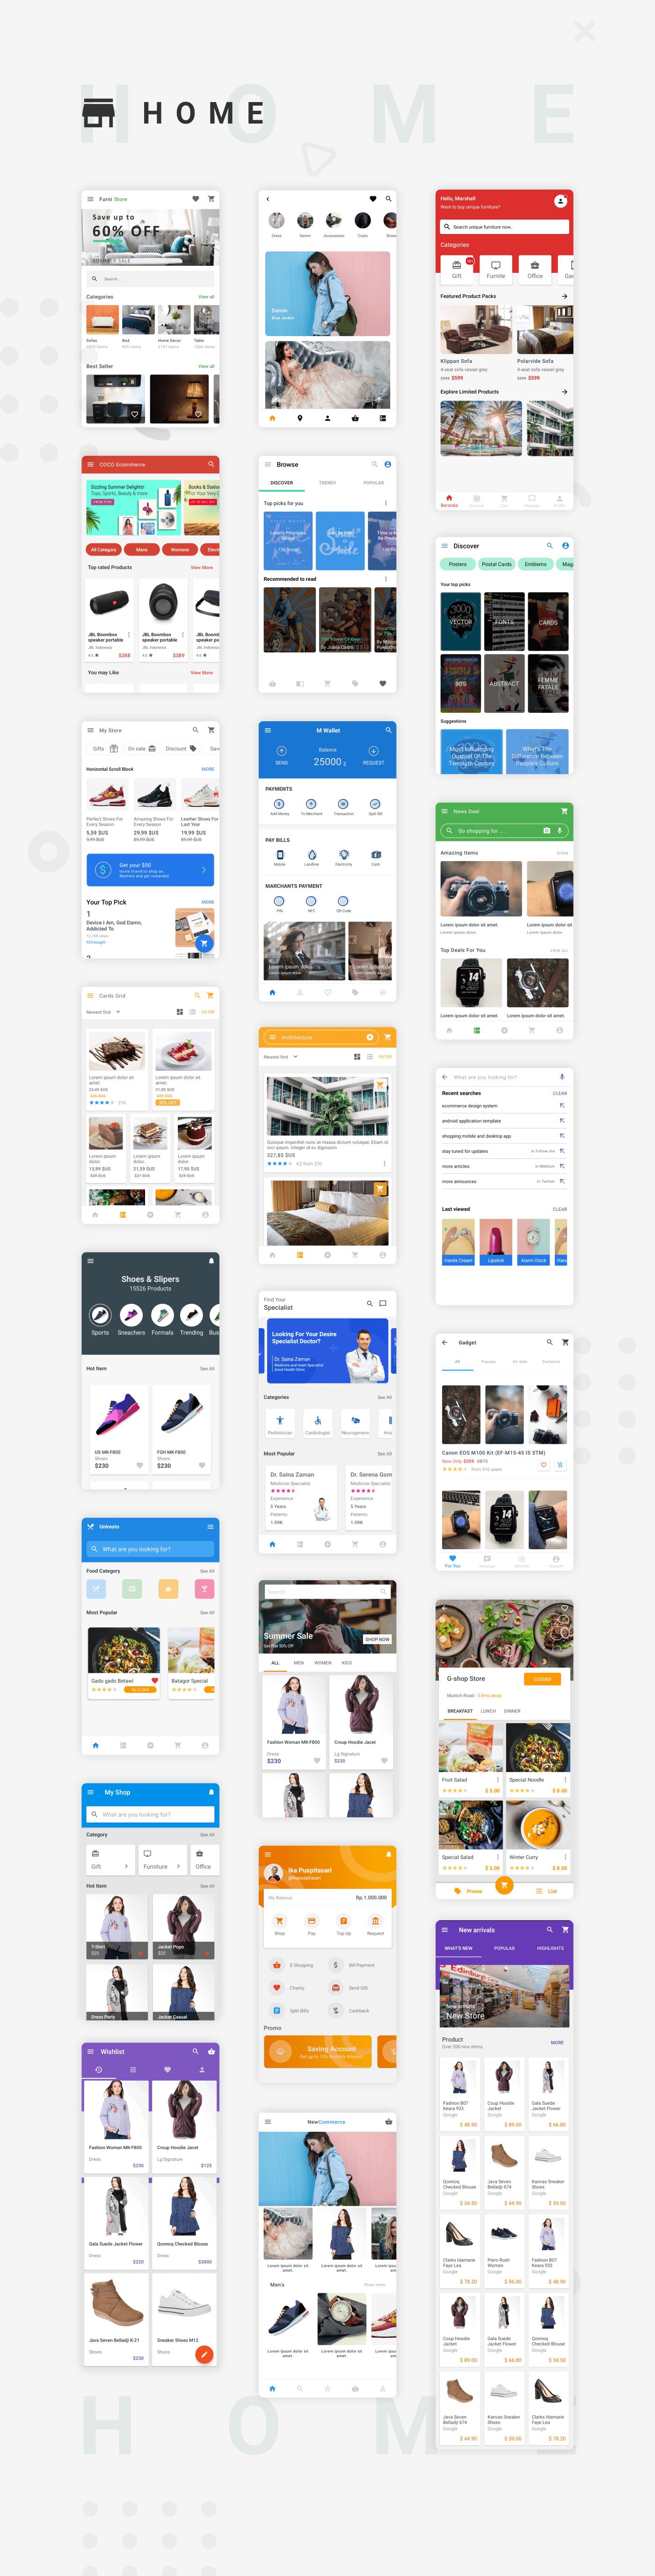 EcommerceX - Premium Ecommerce App UI Kit Template 1.0 - 1